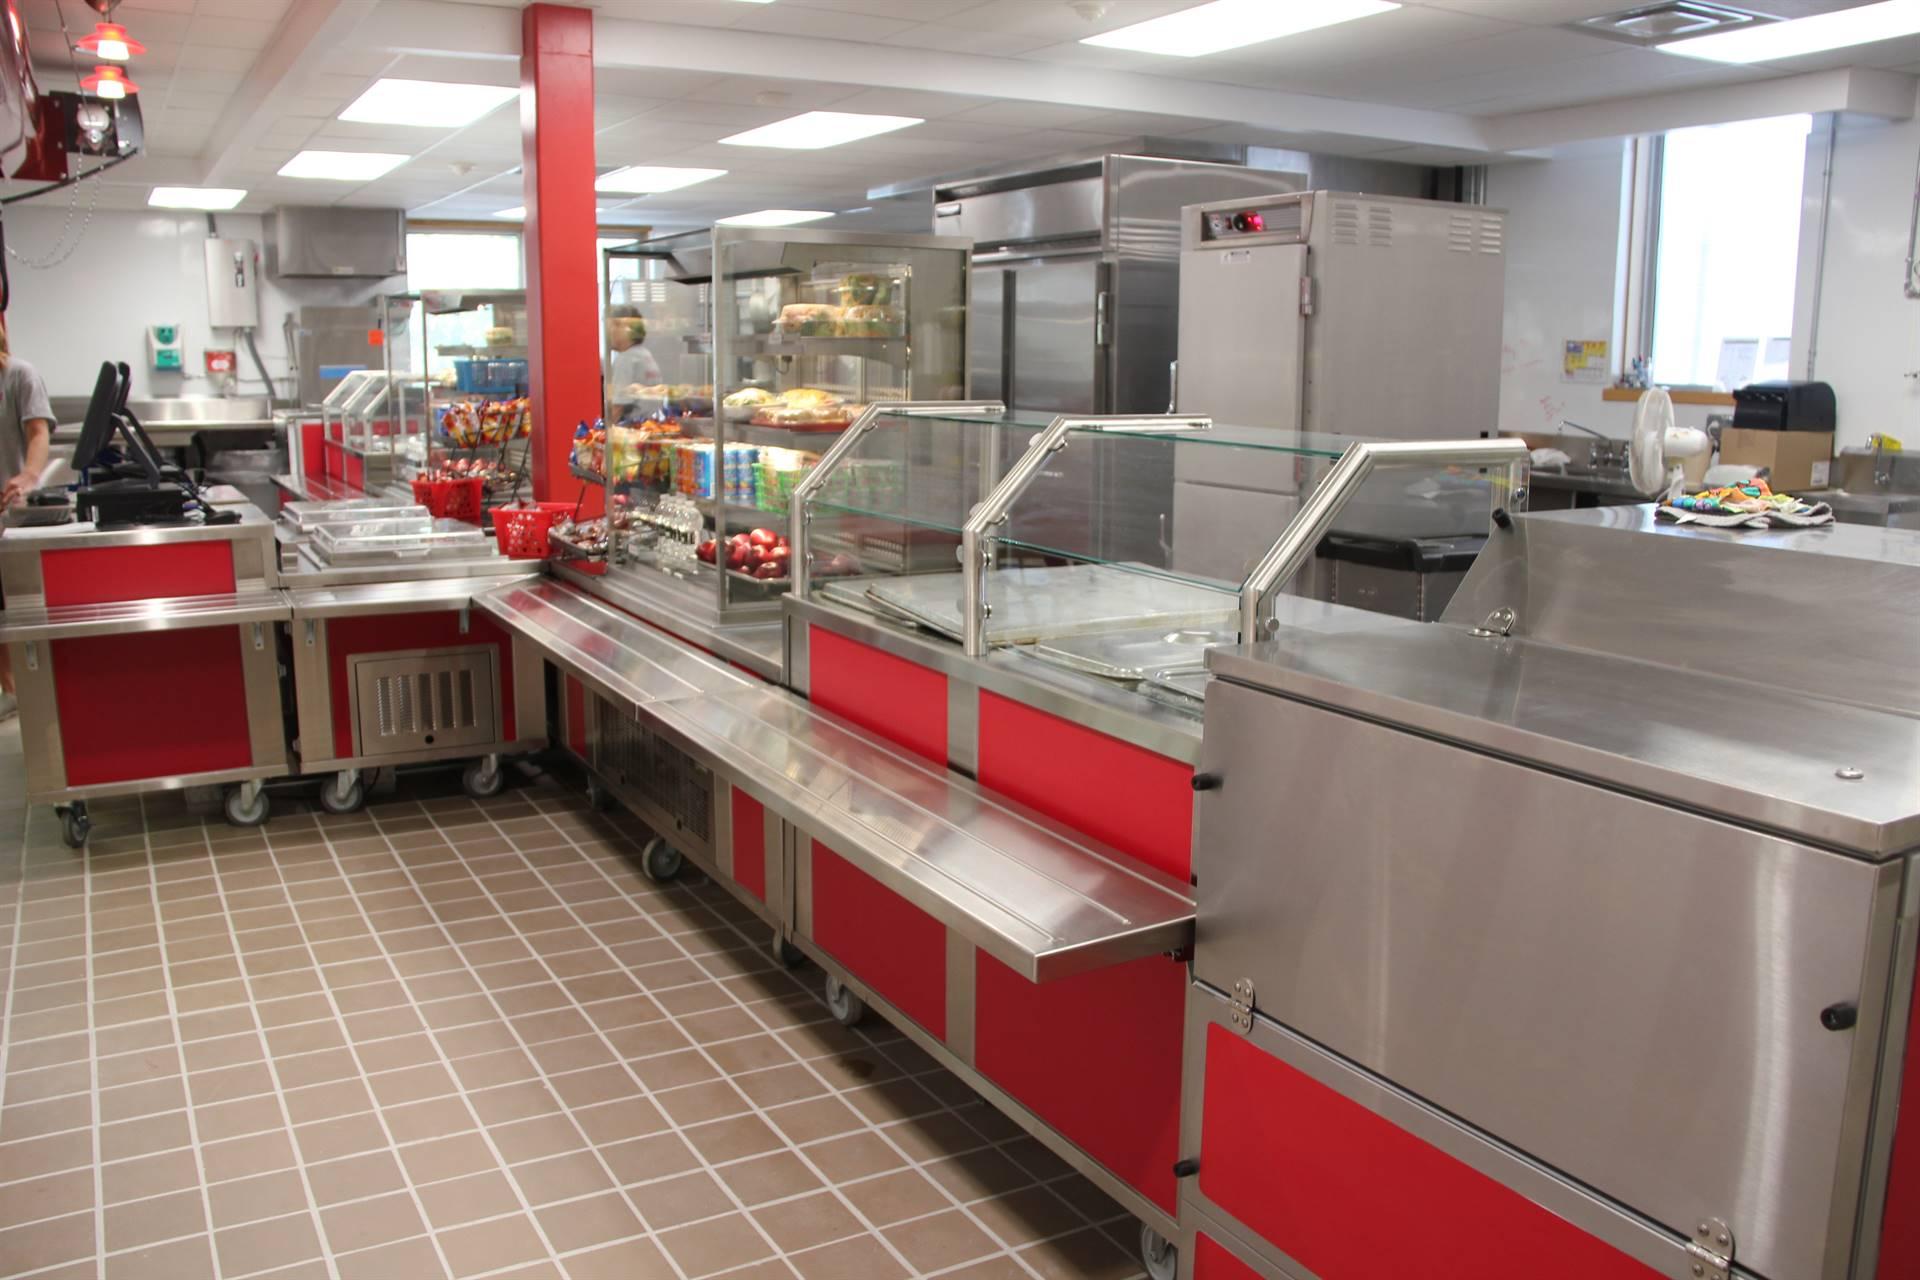 renovated chenango bridge cafeteria kitchen